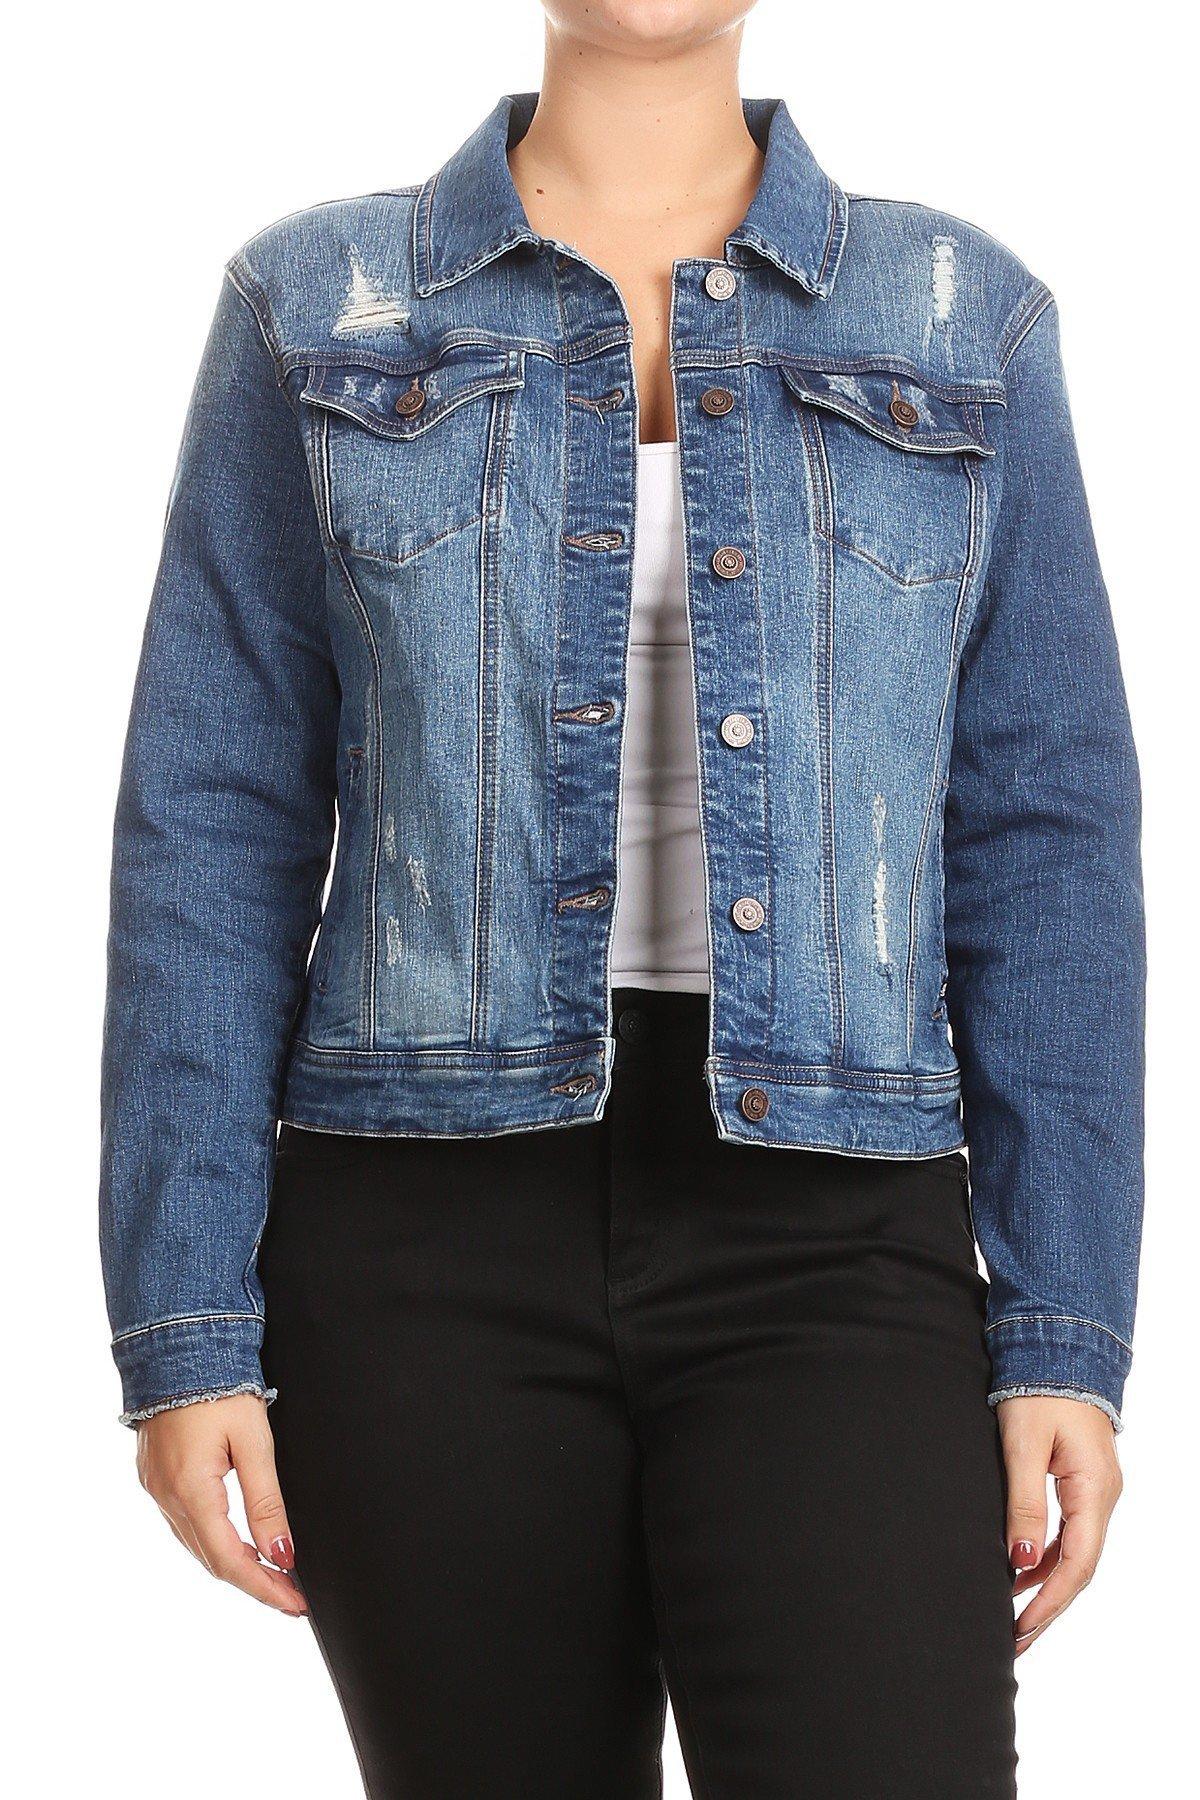 SALT TREE Women's EnJean Women's Plus Size Distressed Denim Jacket